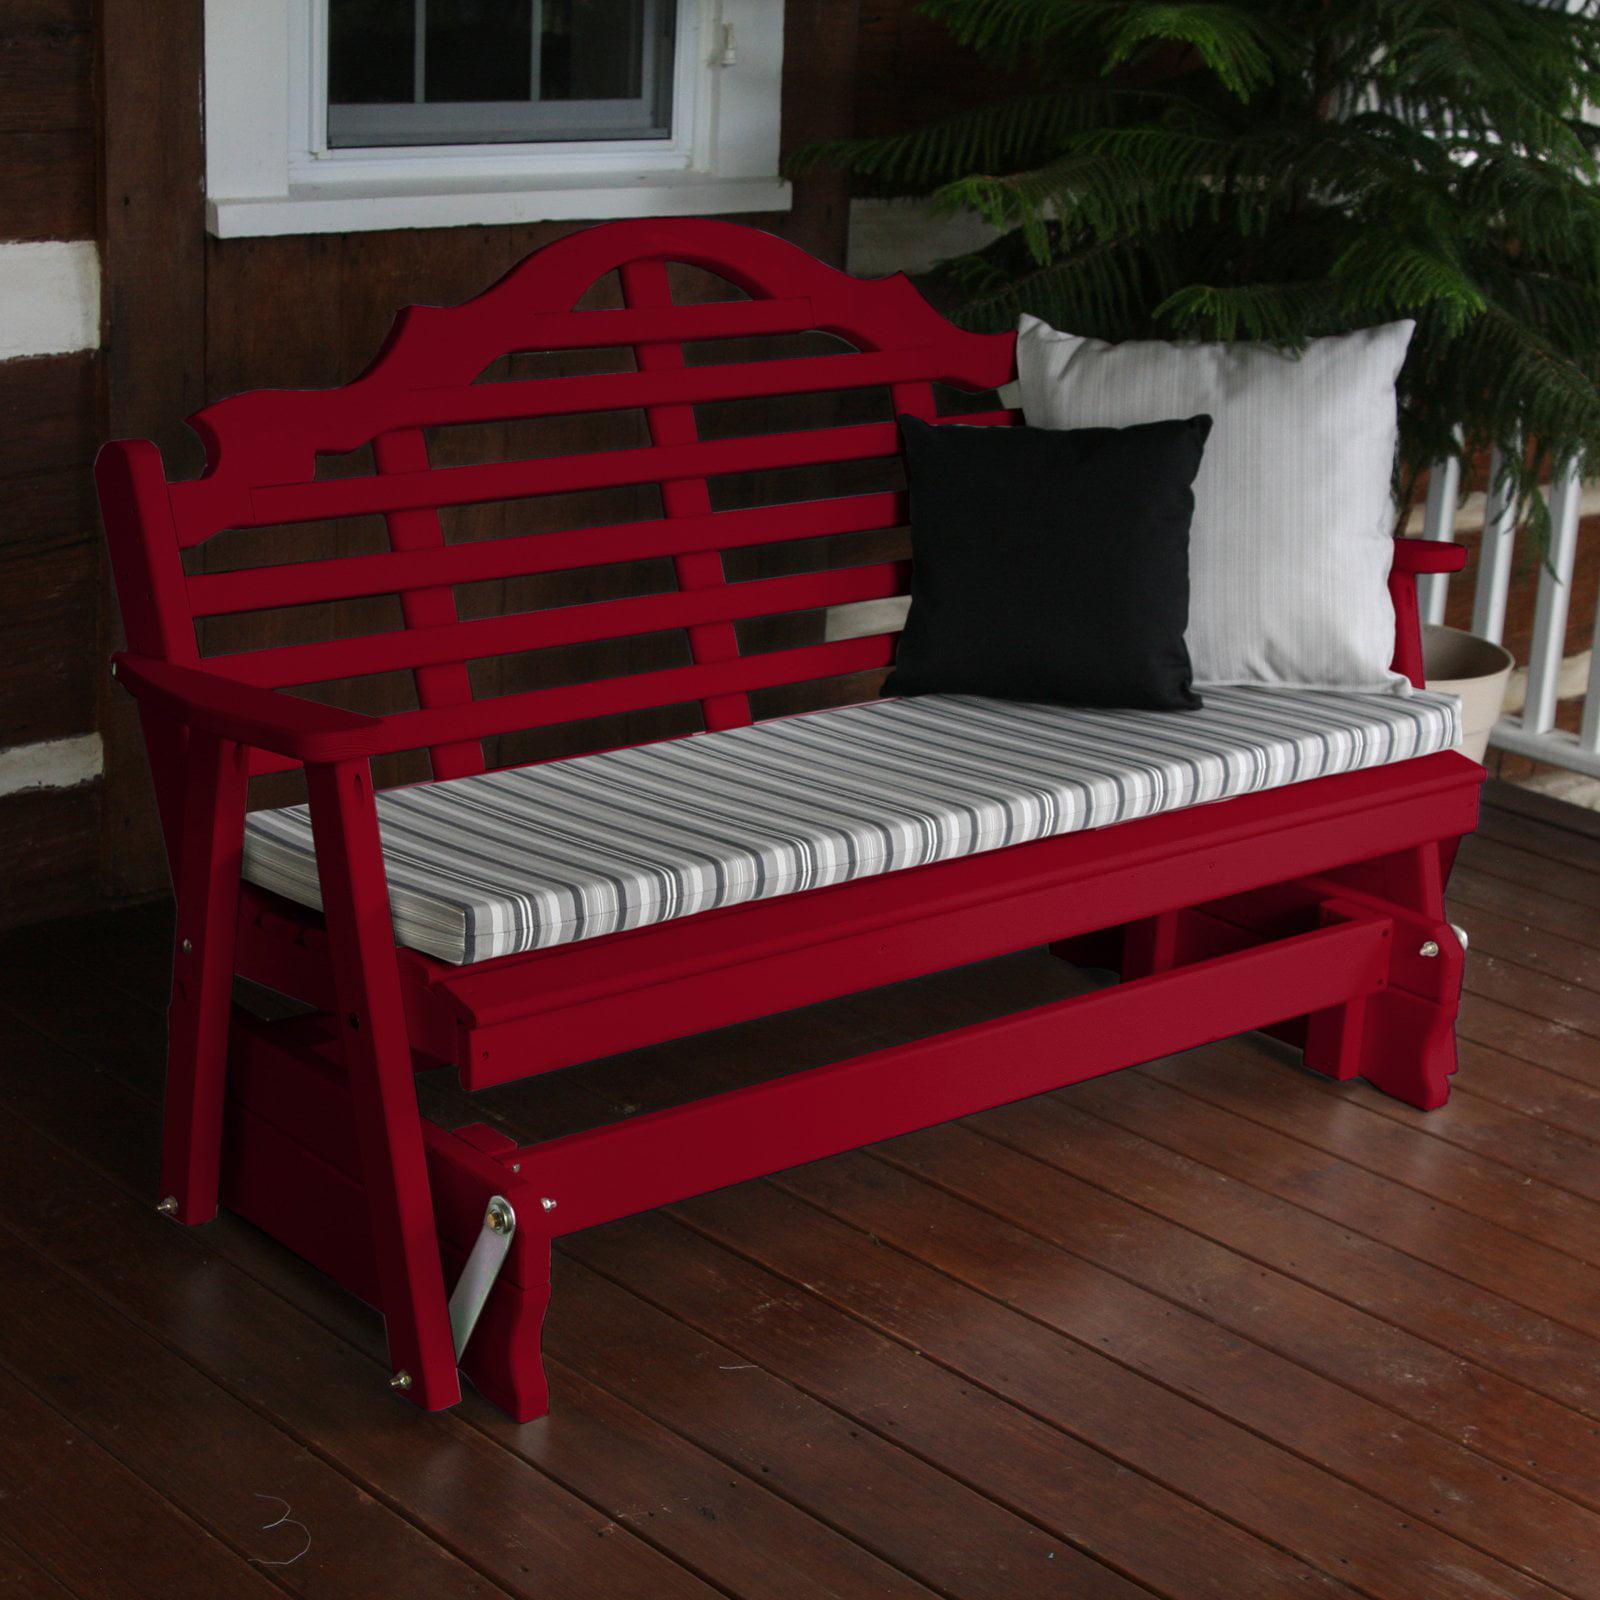 A U0026amp; L Furniture Yellow Pine Marlboro Outdoor Bench Glider   Walmart.com